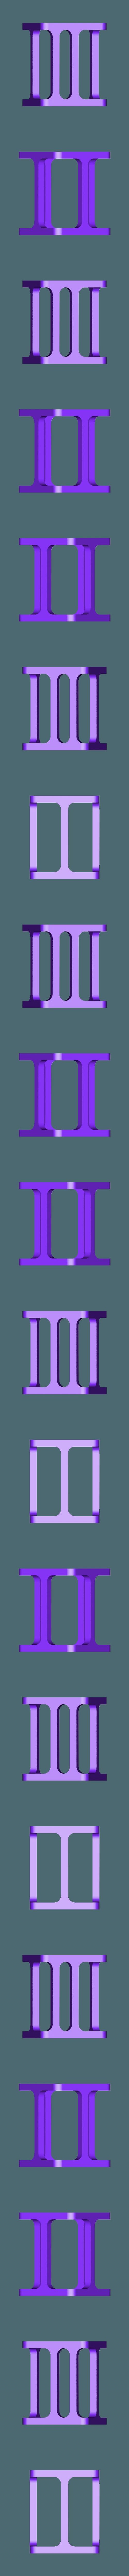 PotACrayonsMetal_iguigui_1.stl Download free STL file Pot à crayons design • Object to 3D print, iguigui